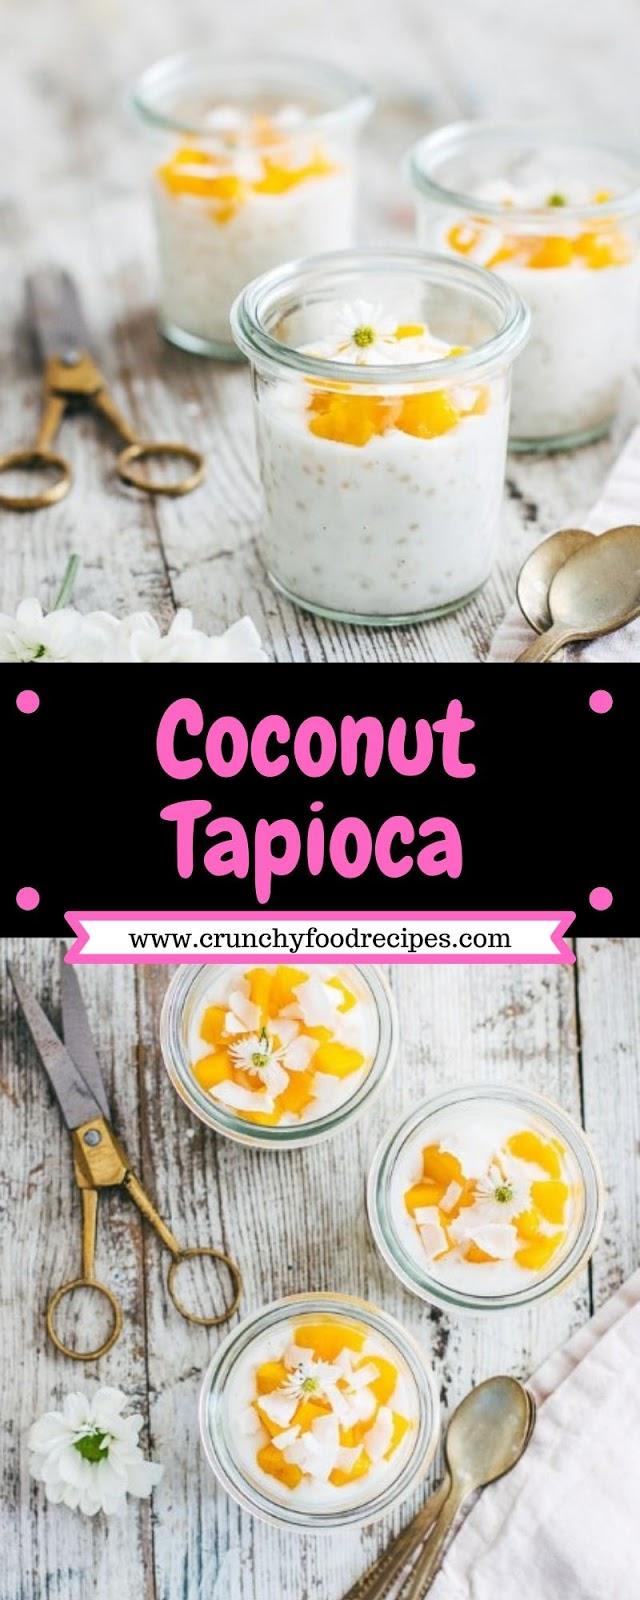 Coconut Tapioca